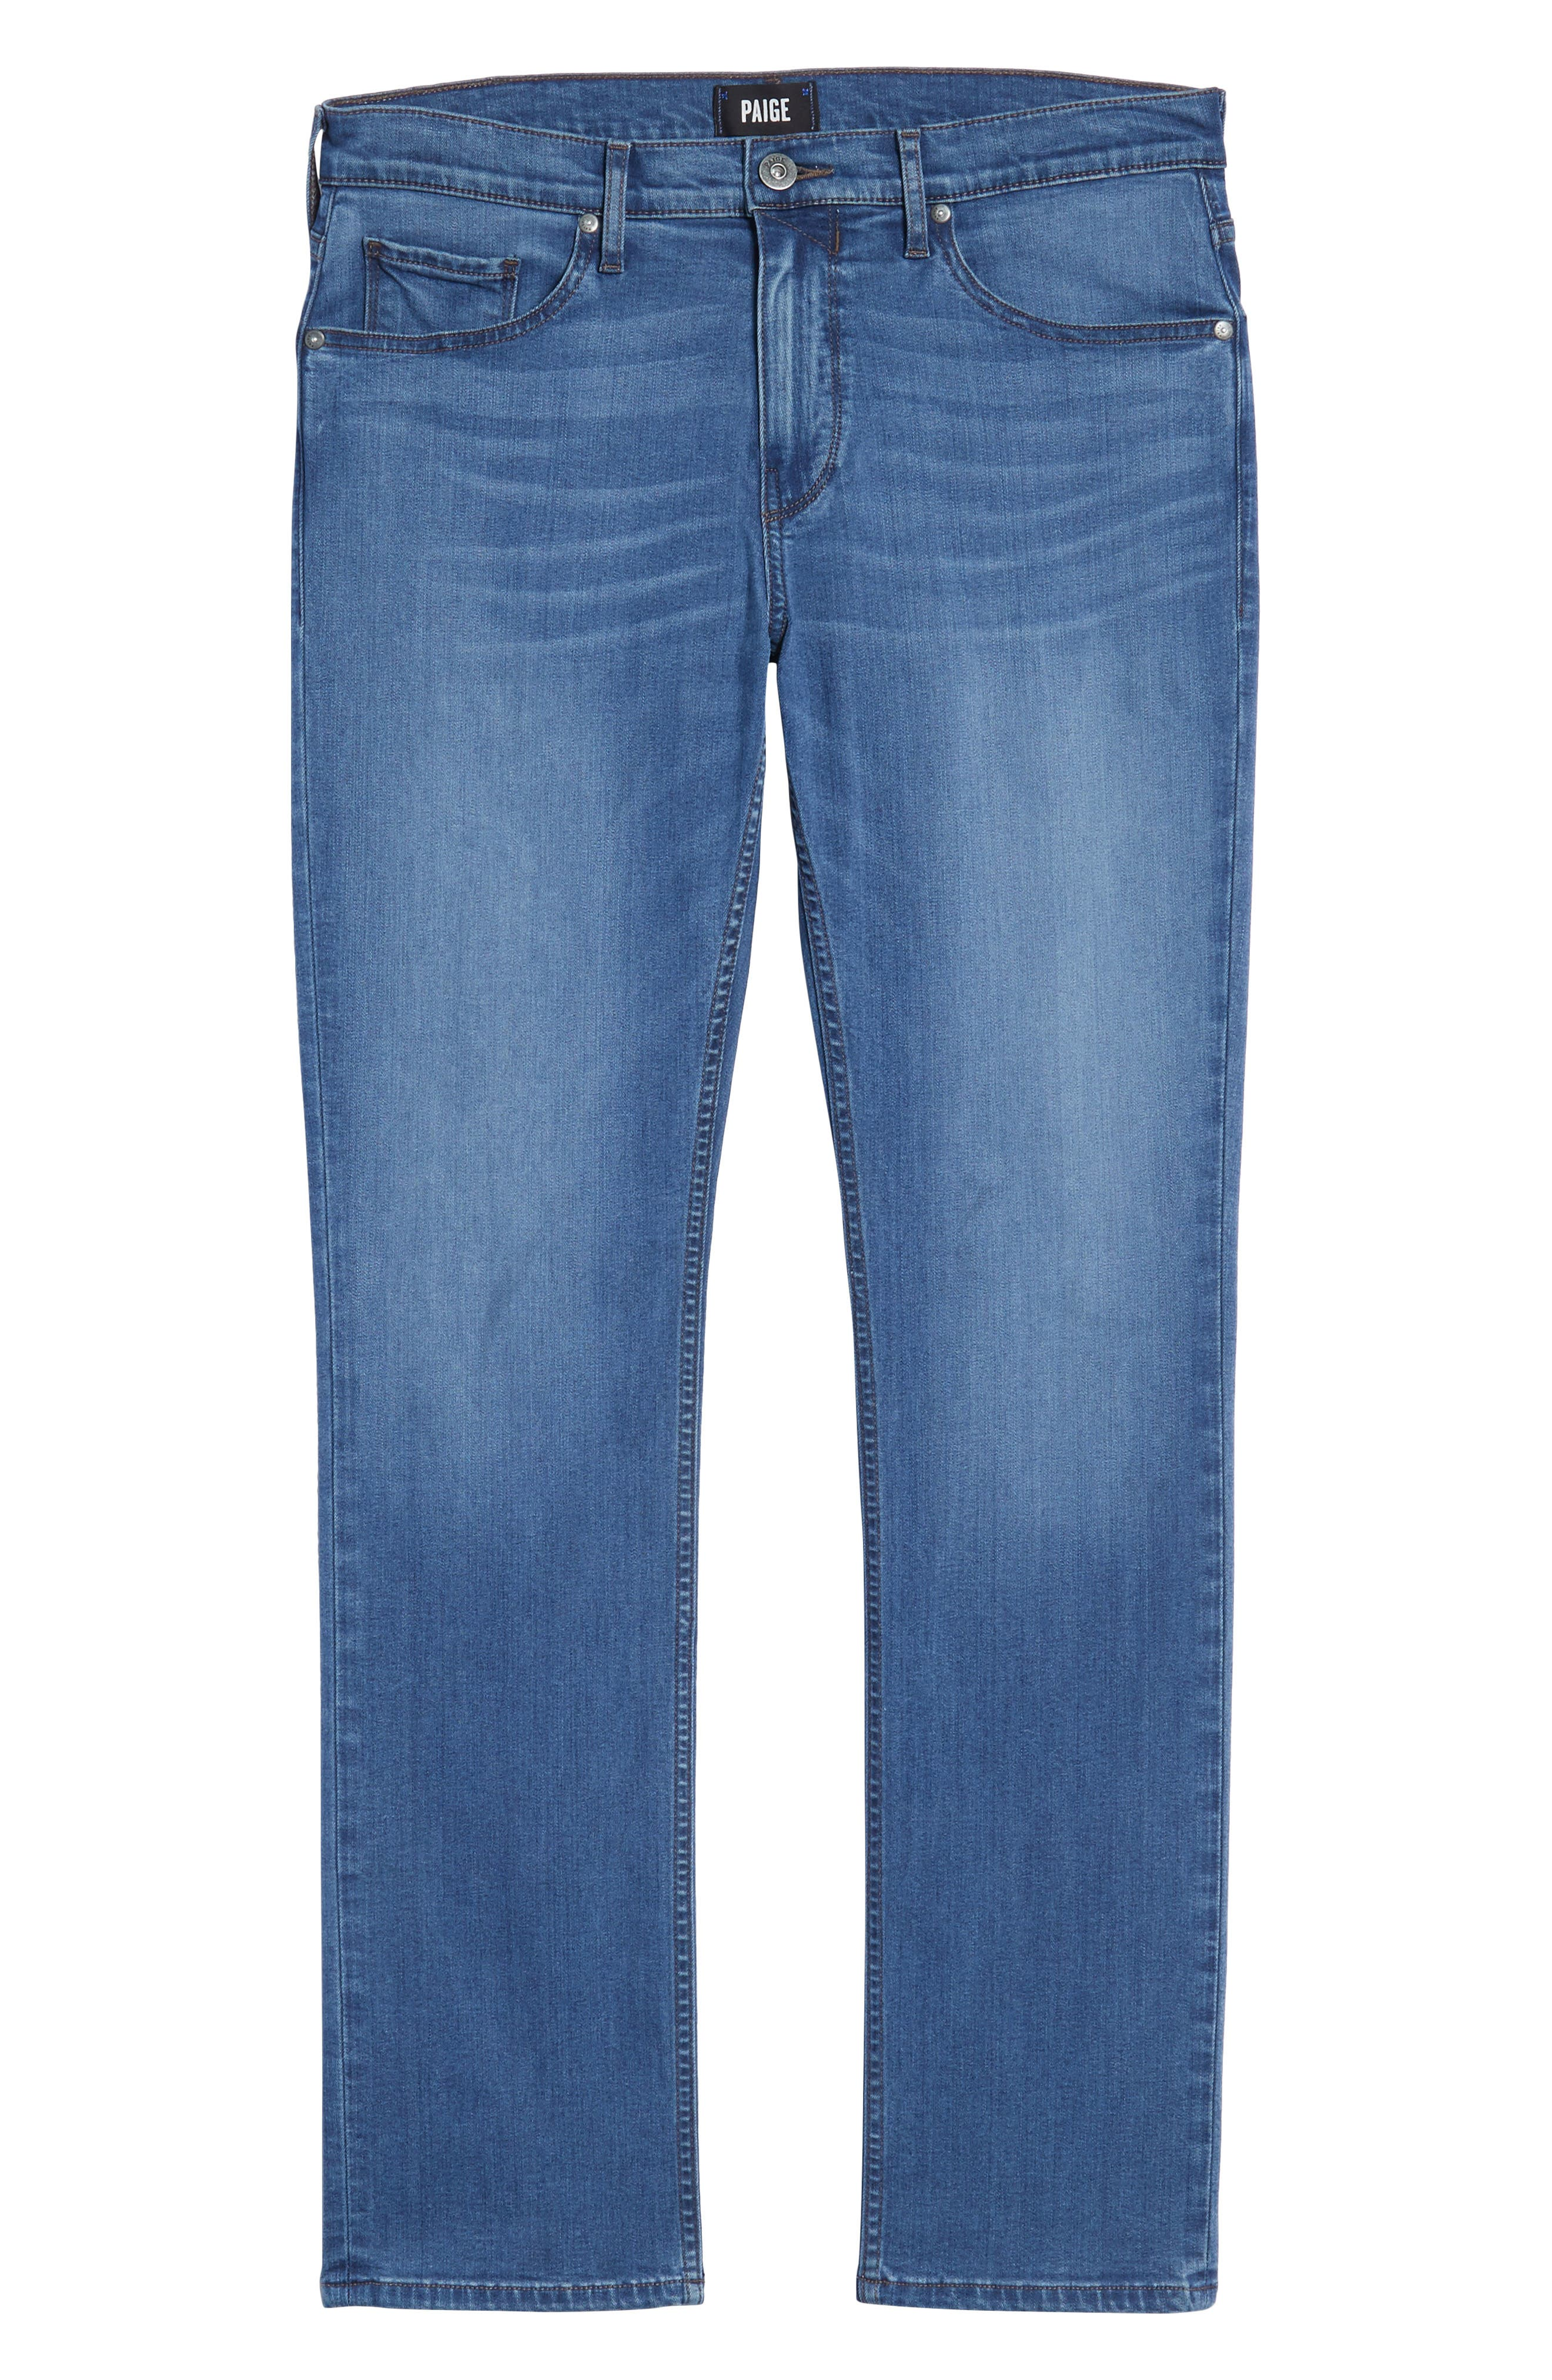 Federal Slim Straight Leg Jeans,                             Alternate thumbnail 6, color,                             Ellice